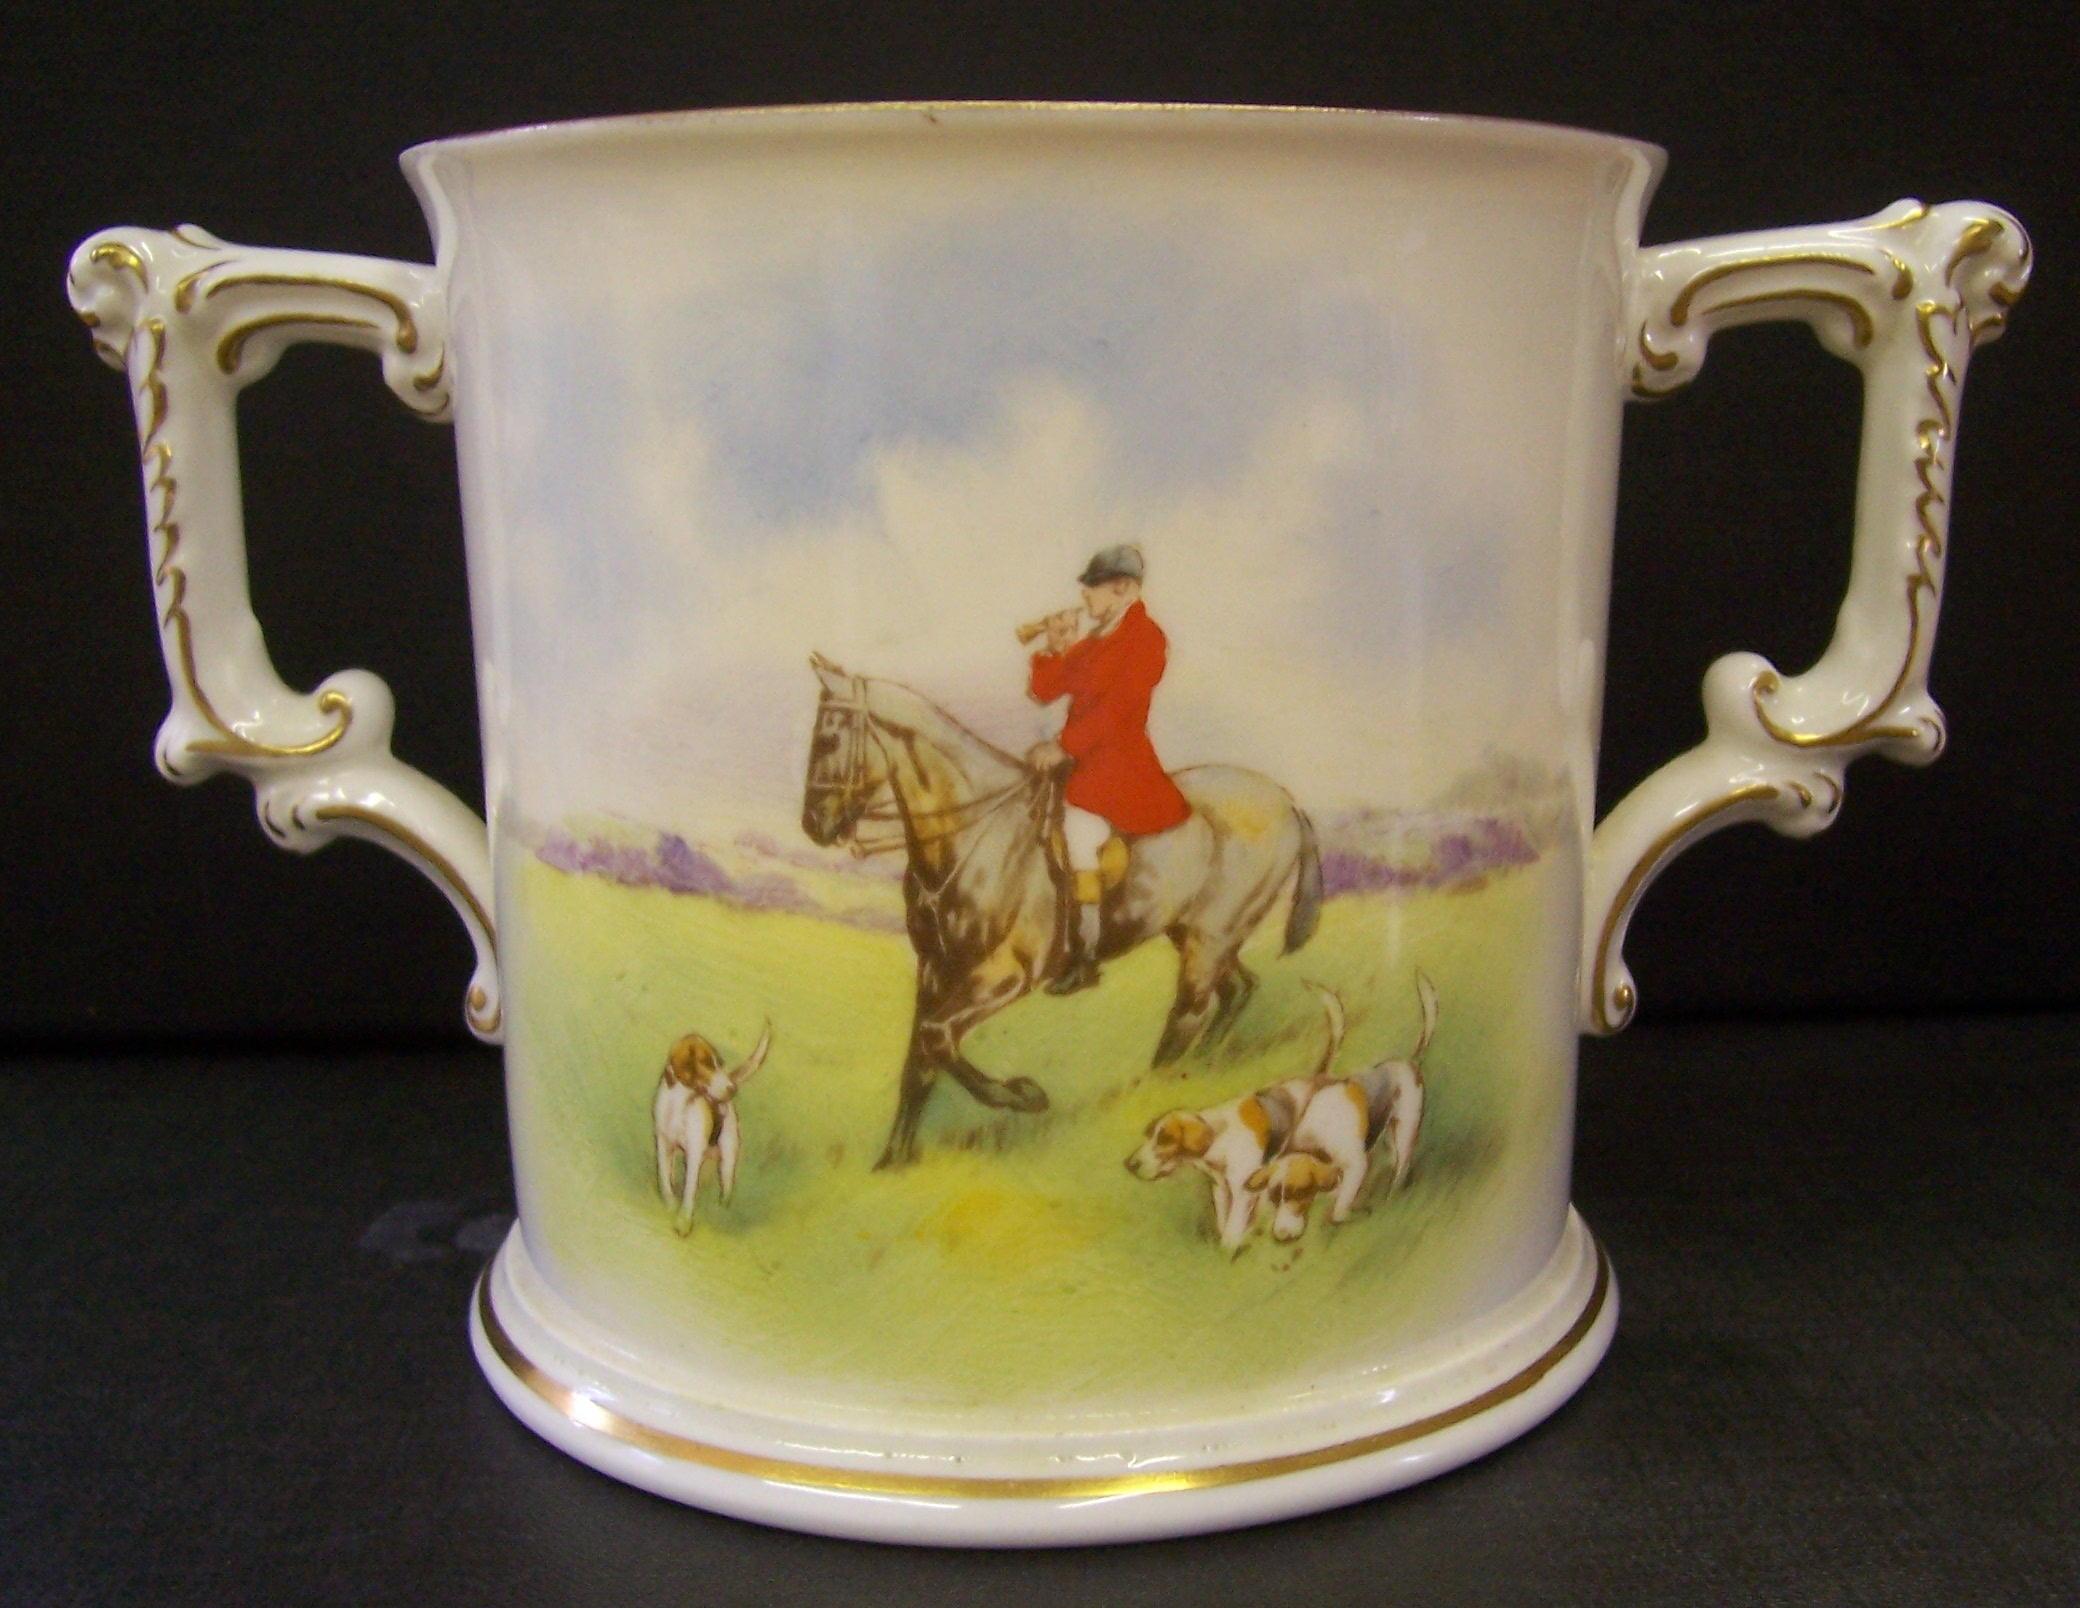 royal-crown-derby-large-loving-cup-hunting-scene-reverse